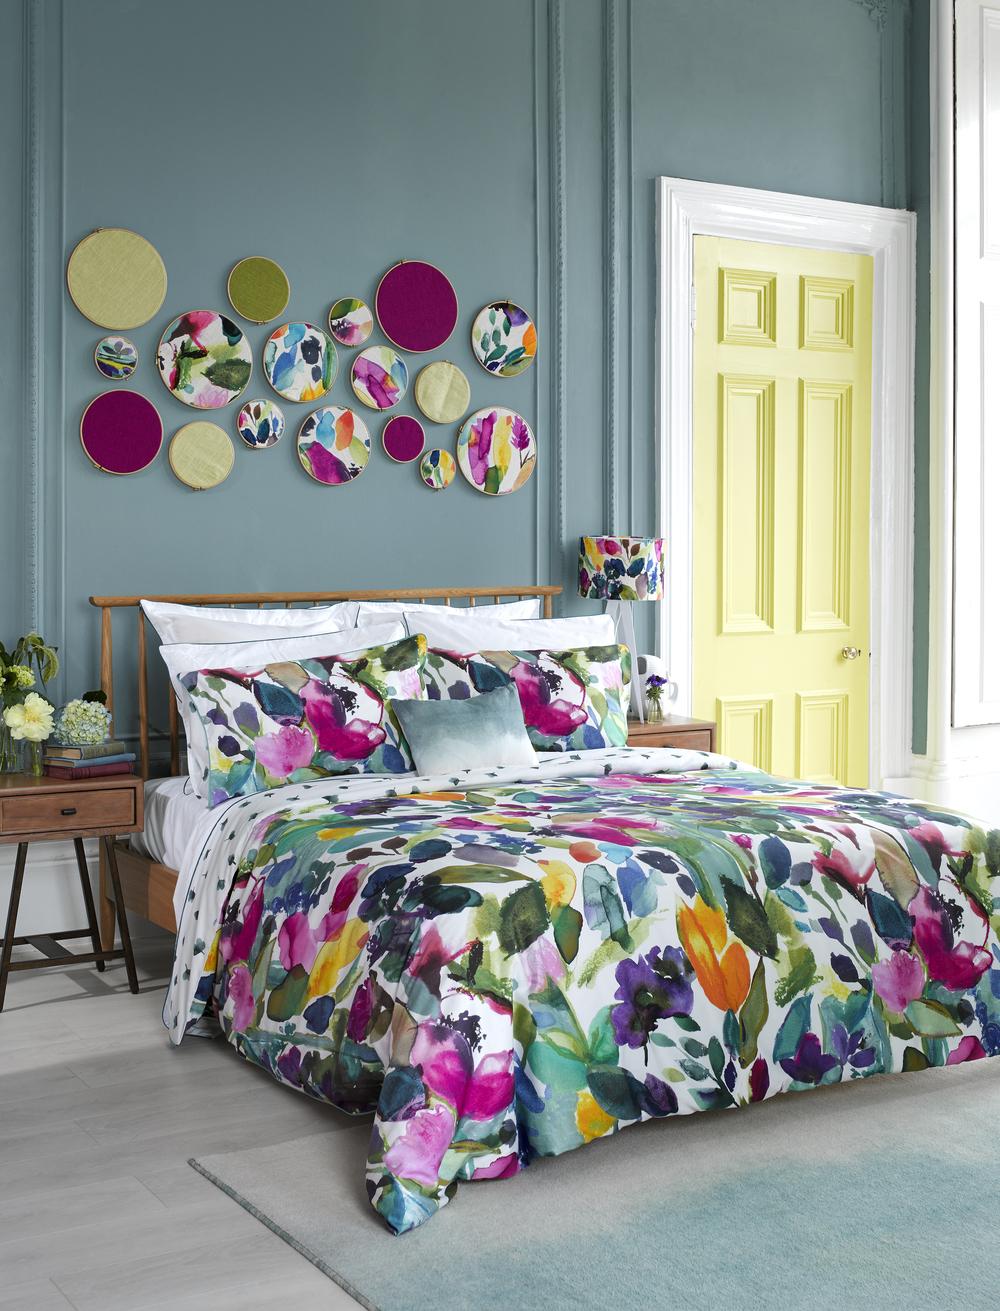 New Bluebellgray Bedding Collection — Heart Home